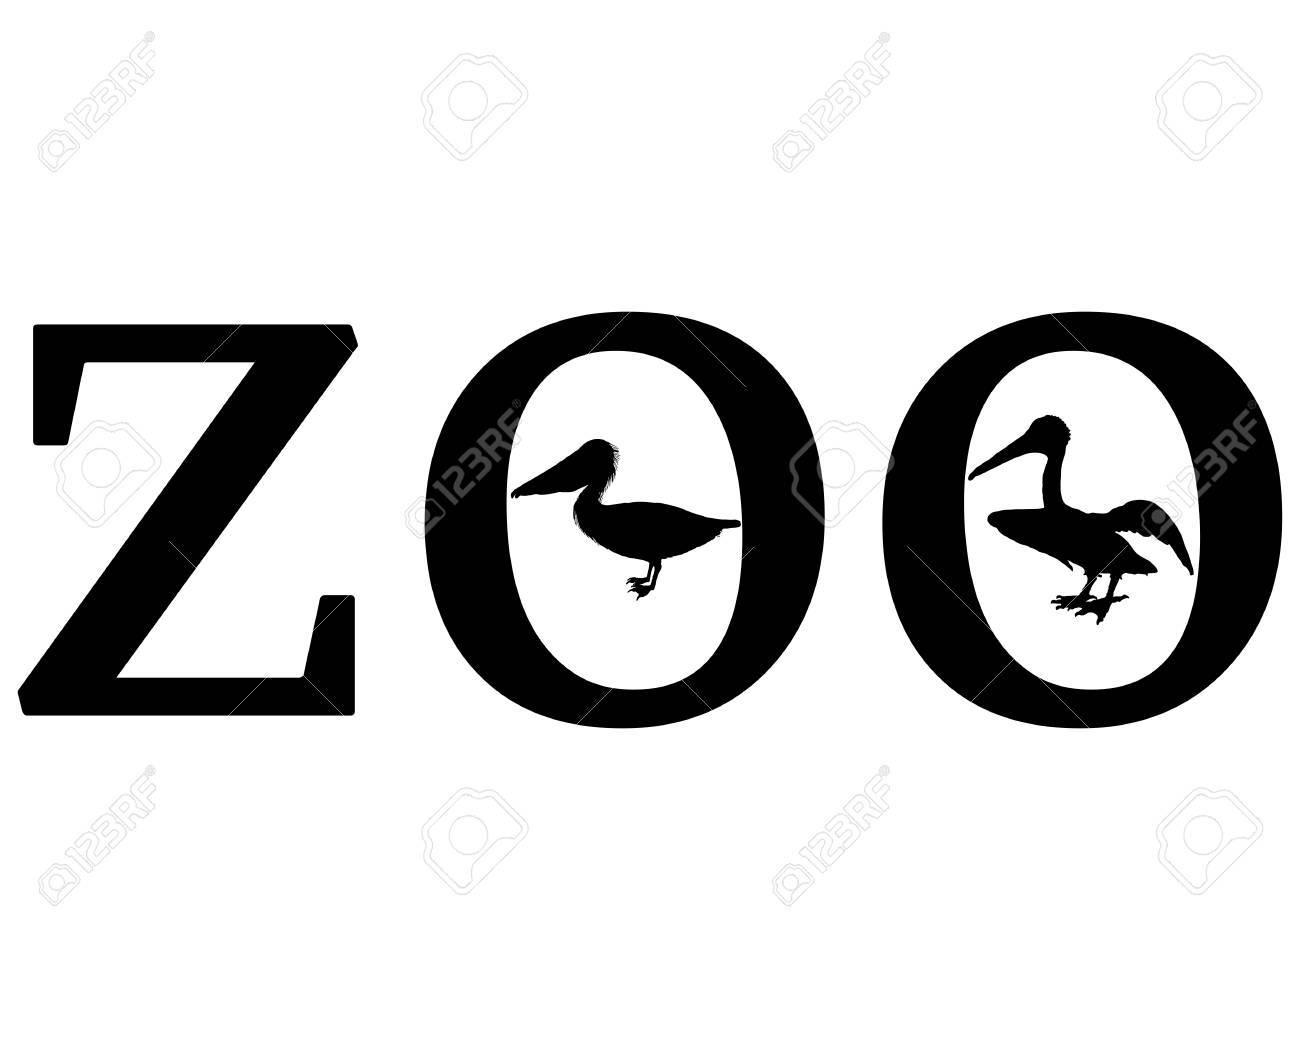 Zoo animals Stock Vector - 10120780